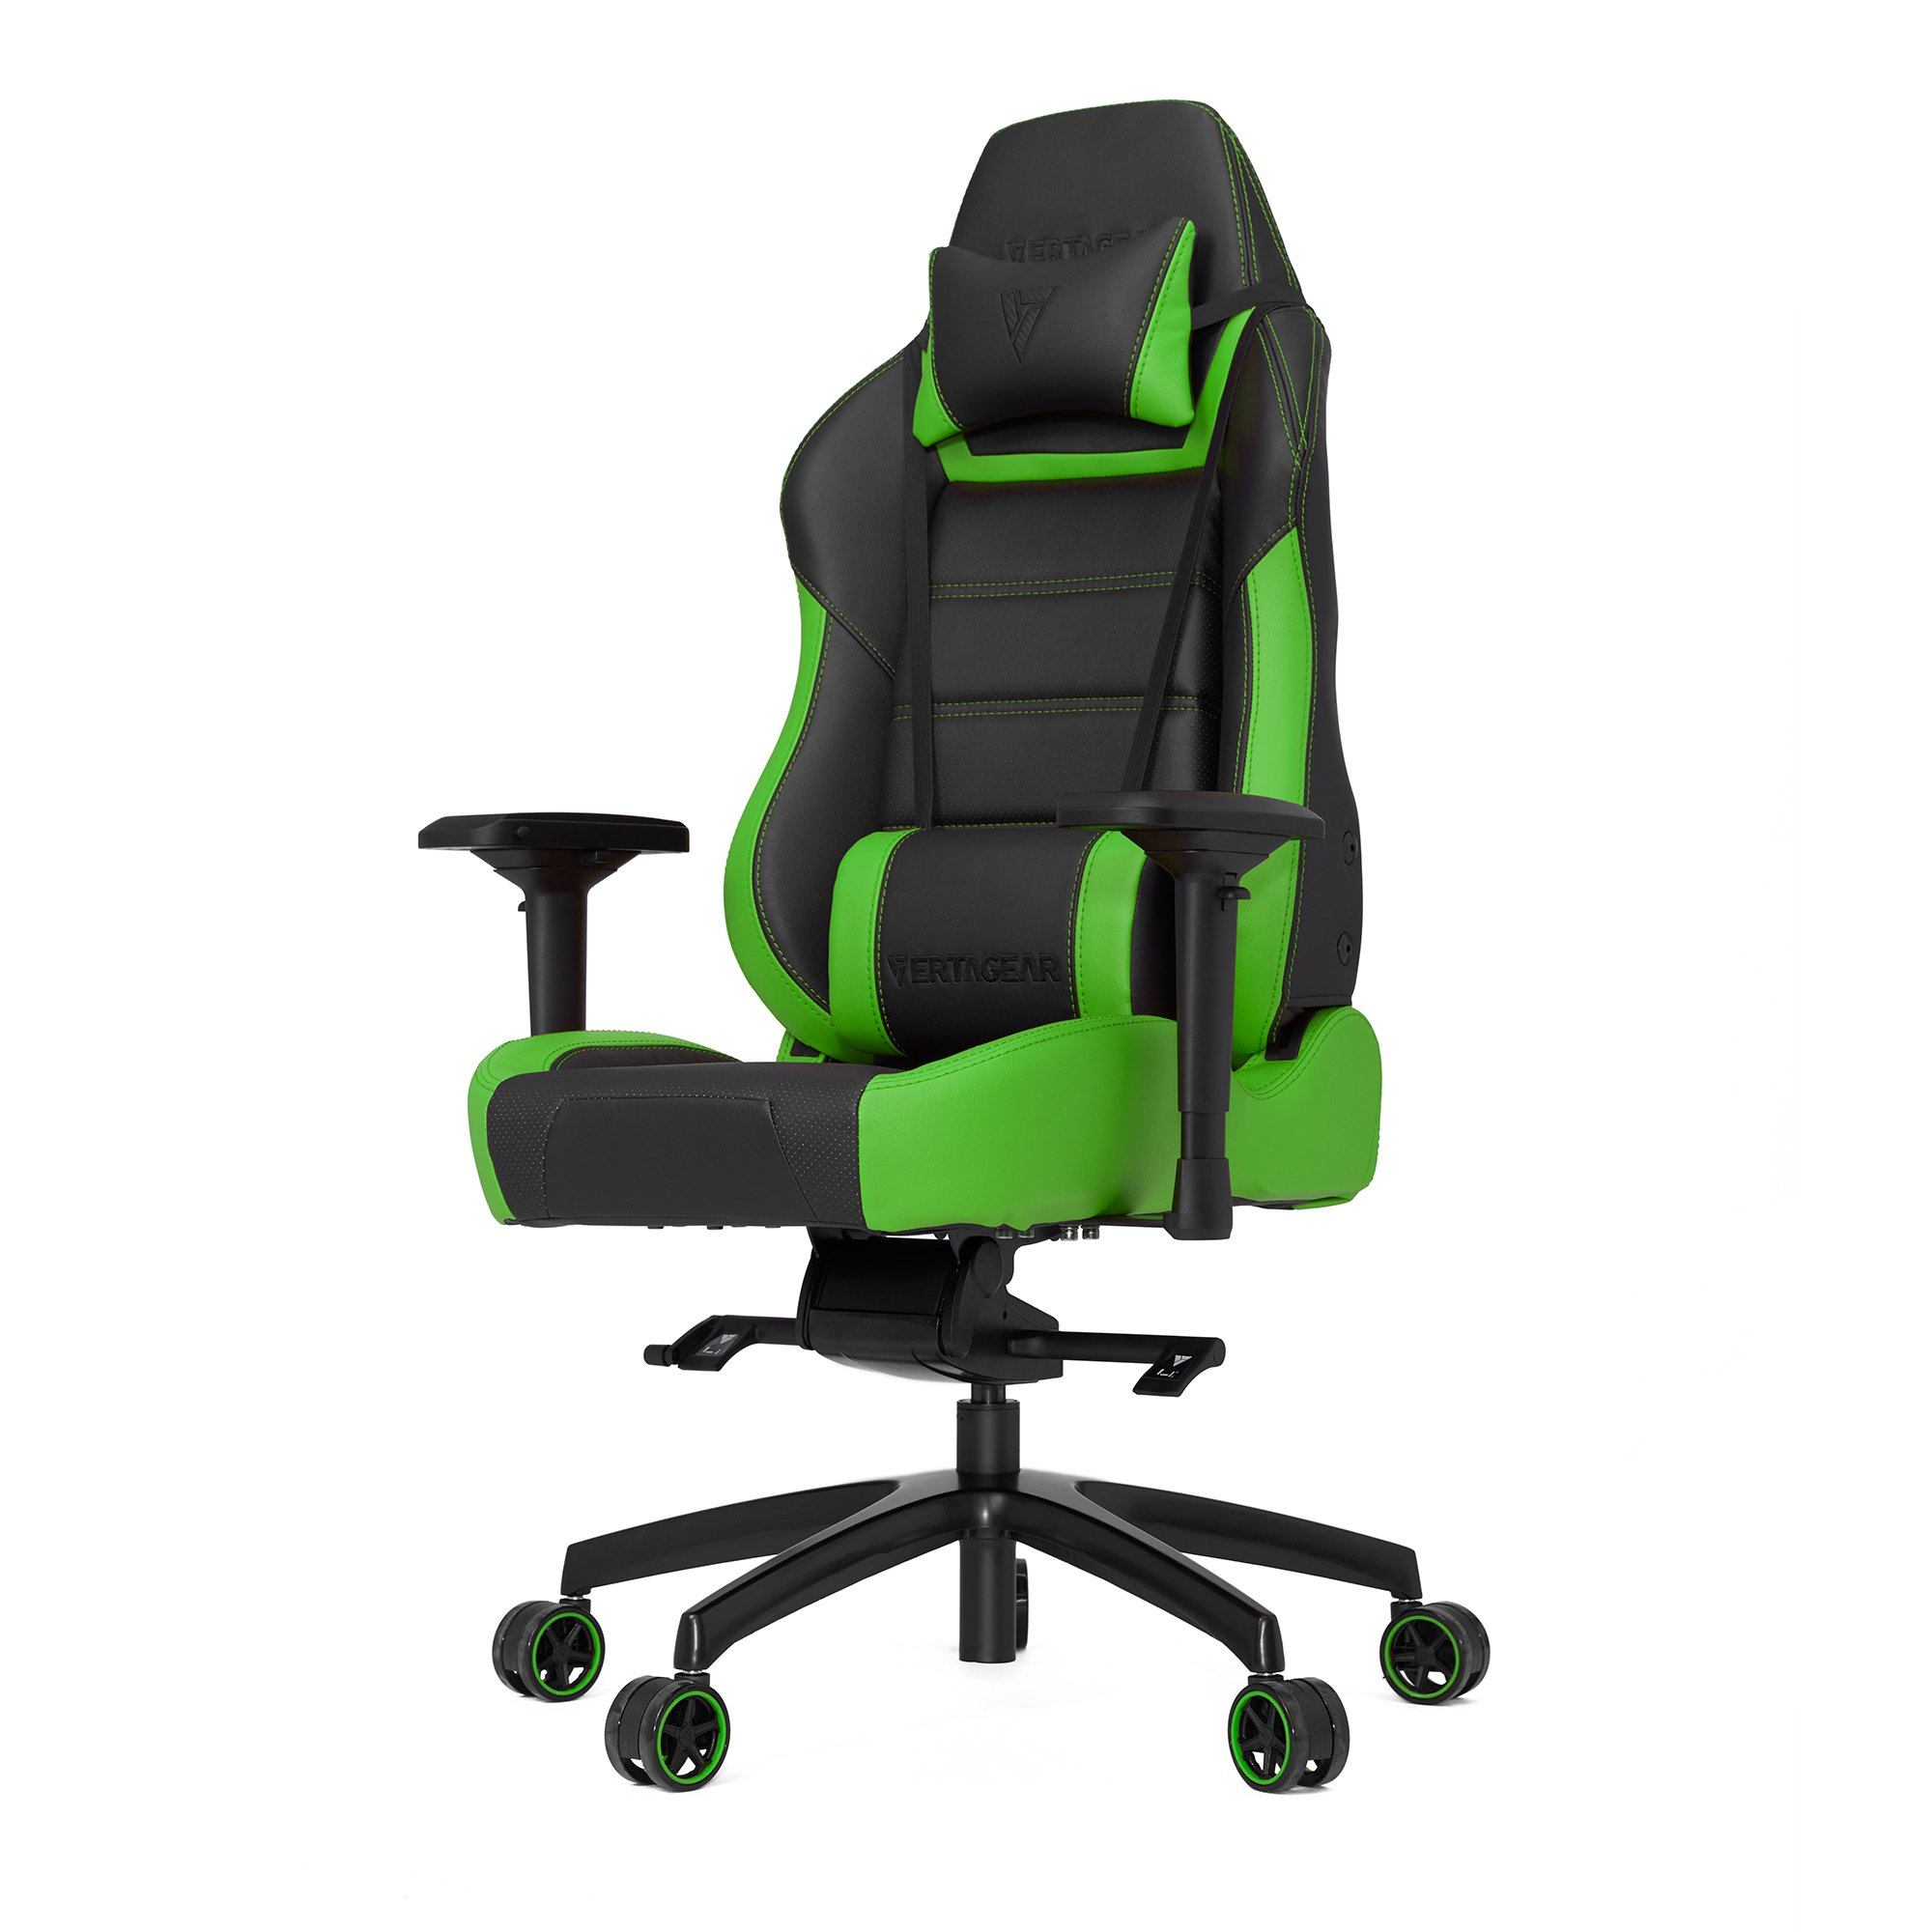 Vertagear P-Line PL6000 Racing Series Gaming Chair - Black/Green (Rev. 2) Nov/2016